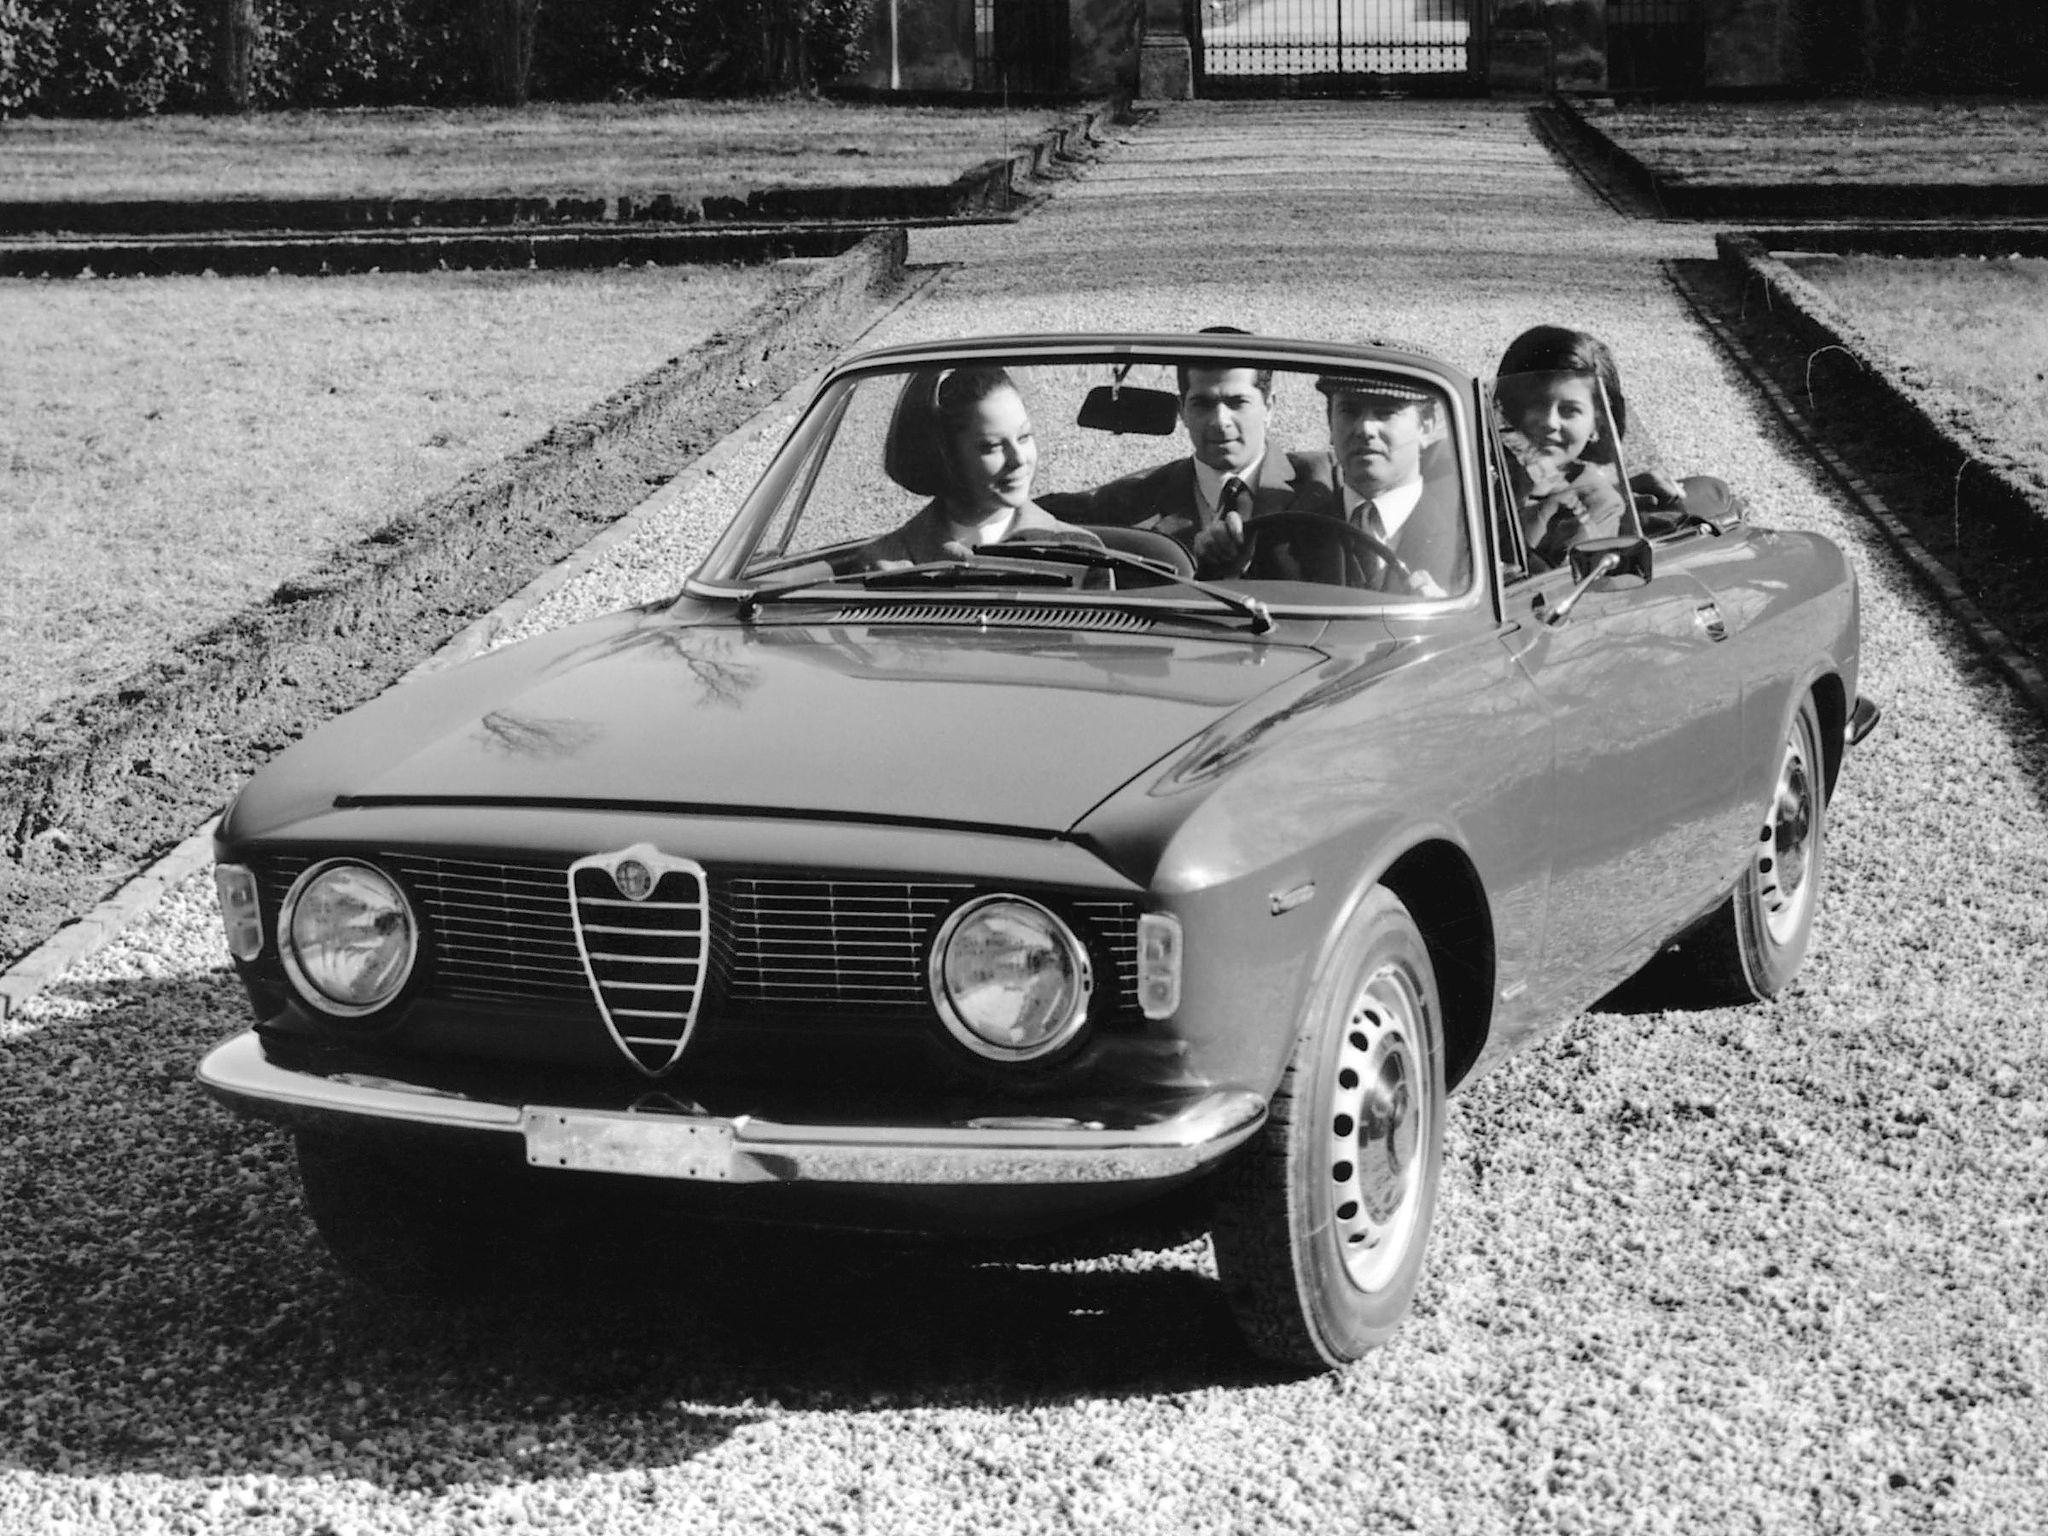 1964 Alfa Romeo Giulia Sprint Gtc Alfa Romeo Auto Veicoli